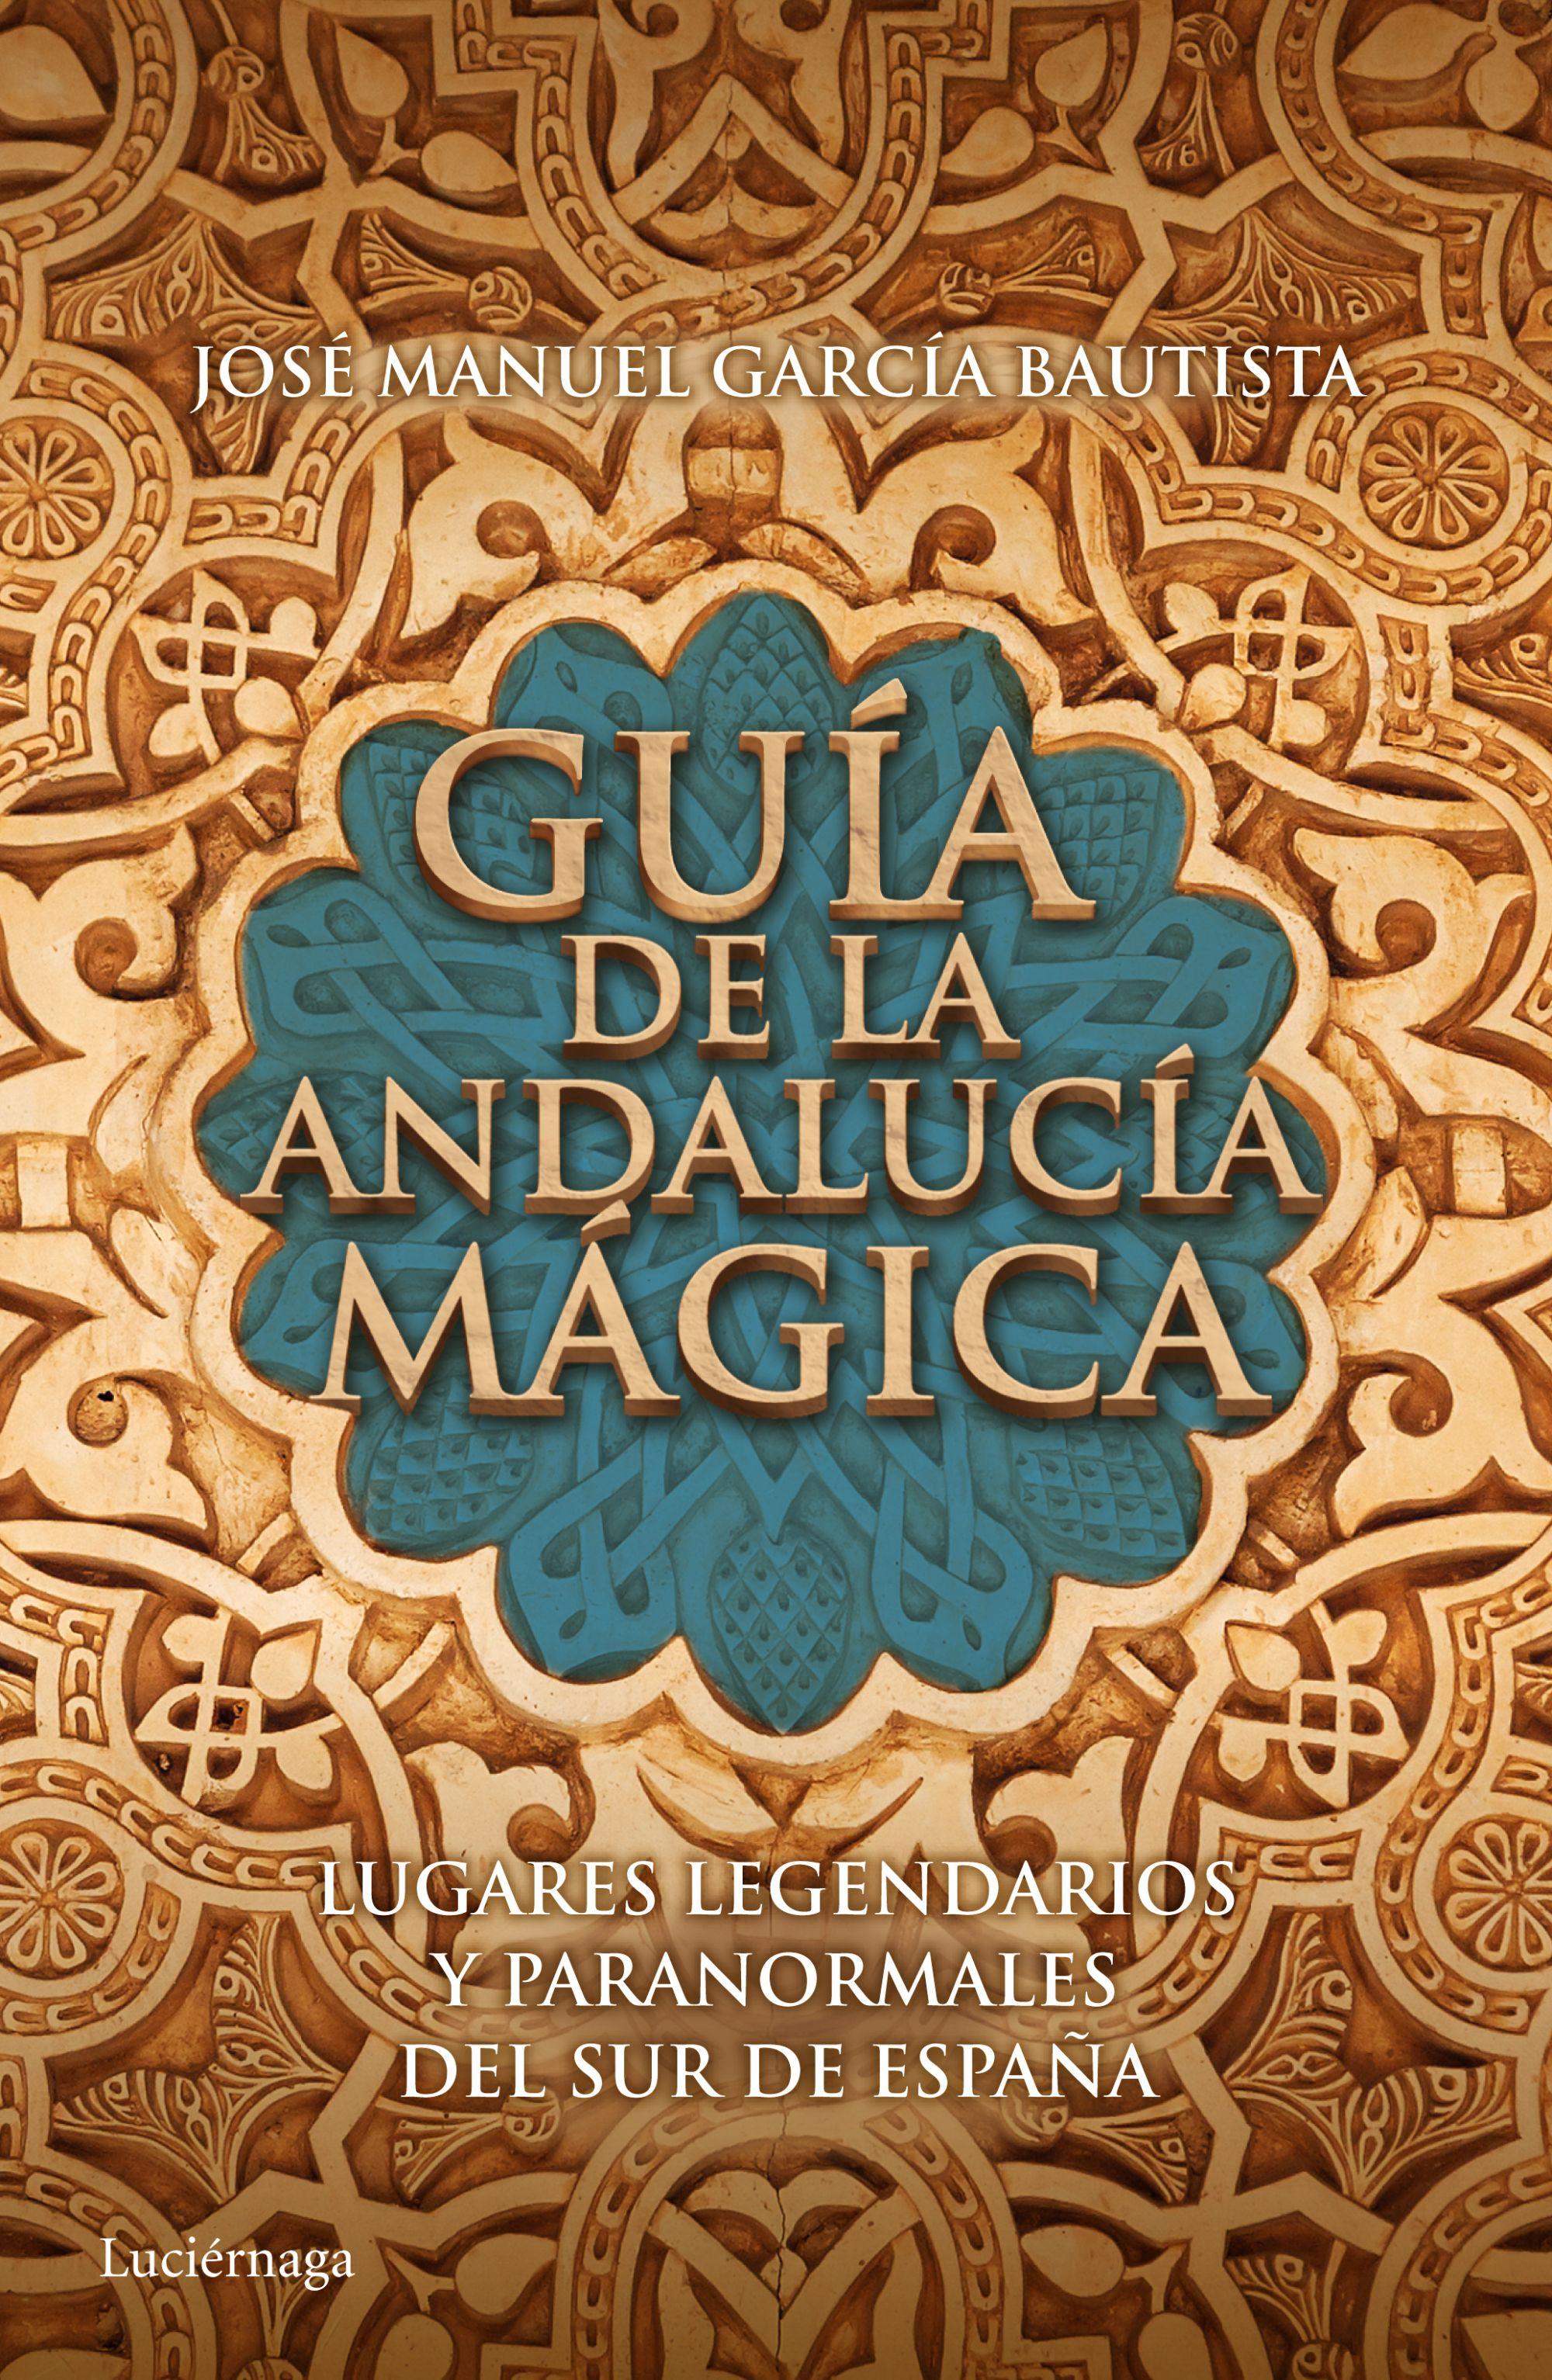 Resultado de imagen de guia magica de andalucia